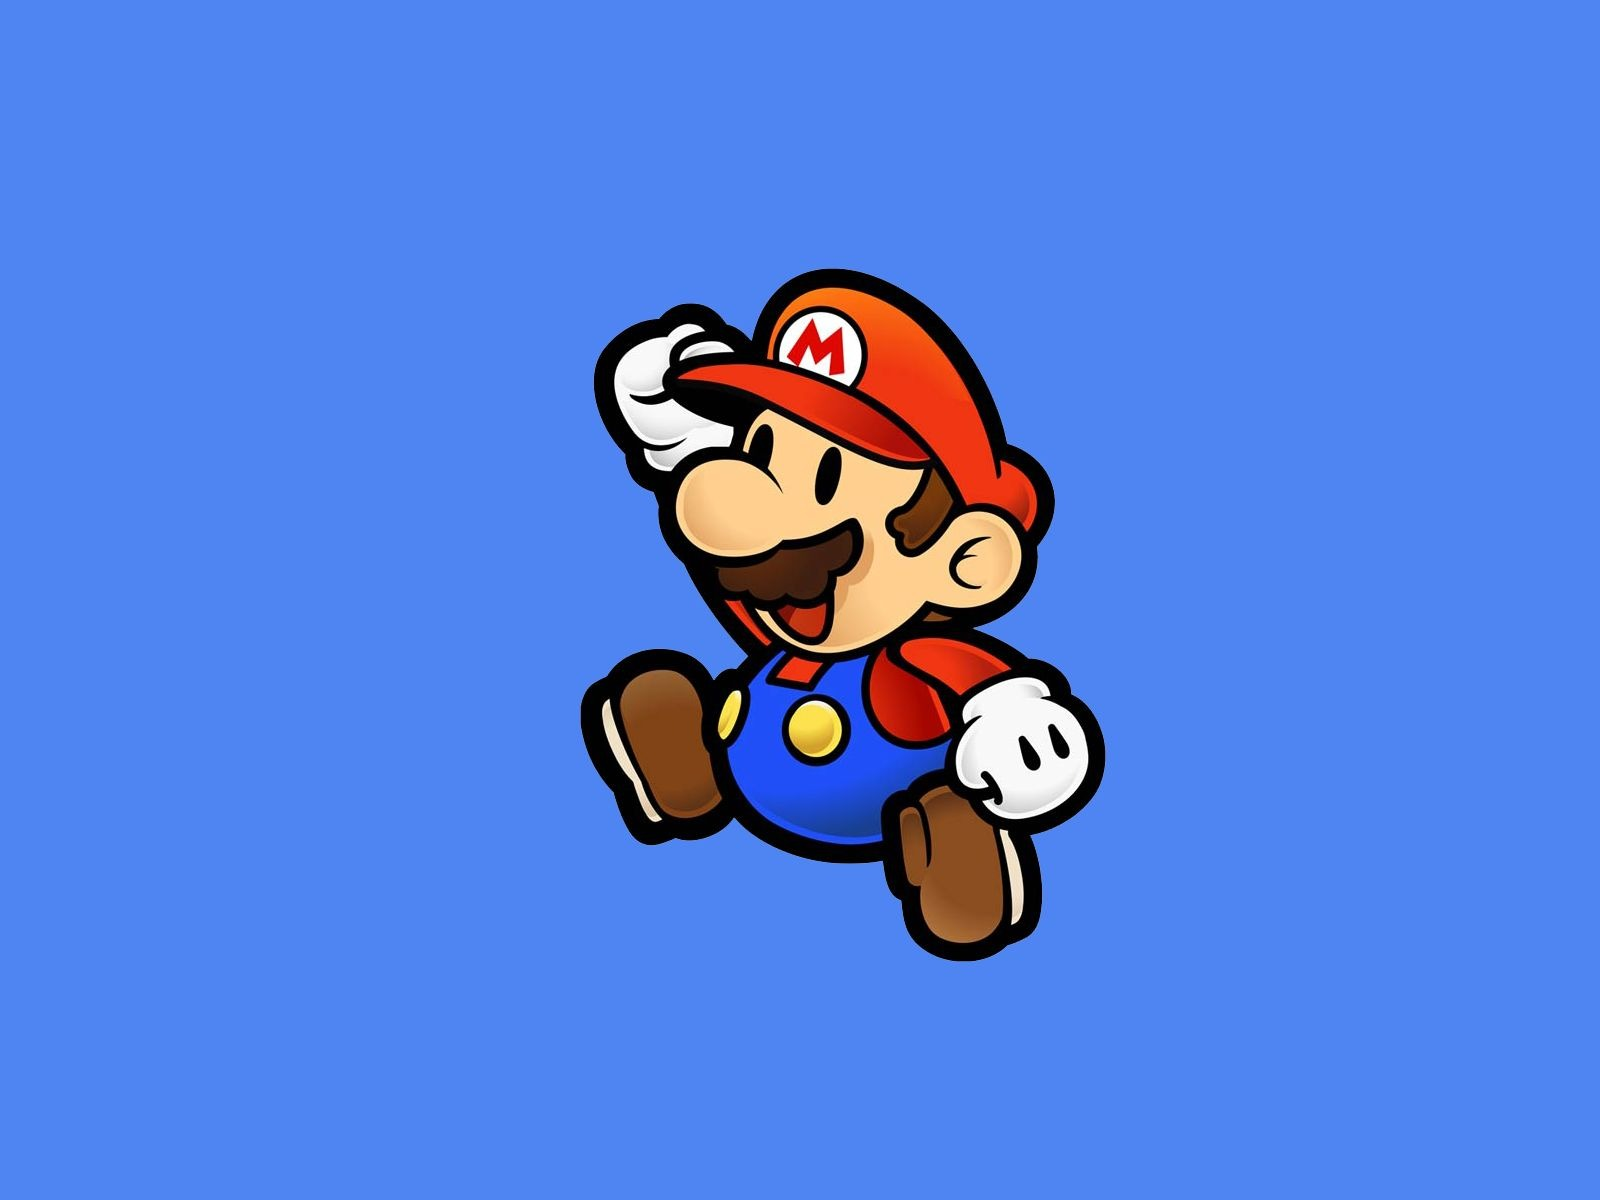 ... Mario Wallpaper; Mario Wallpaper